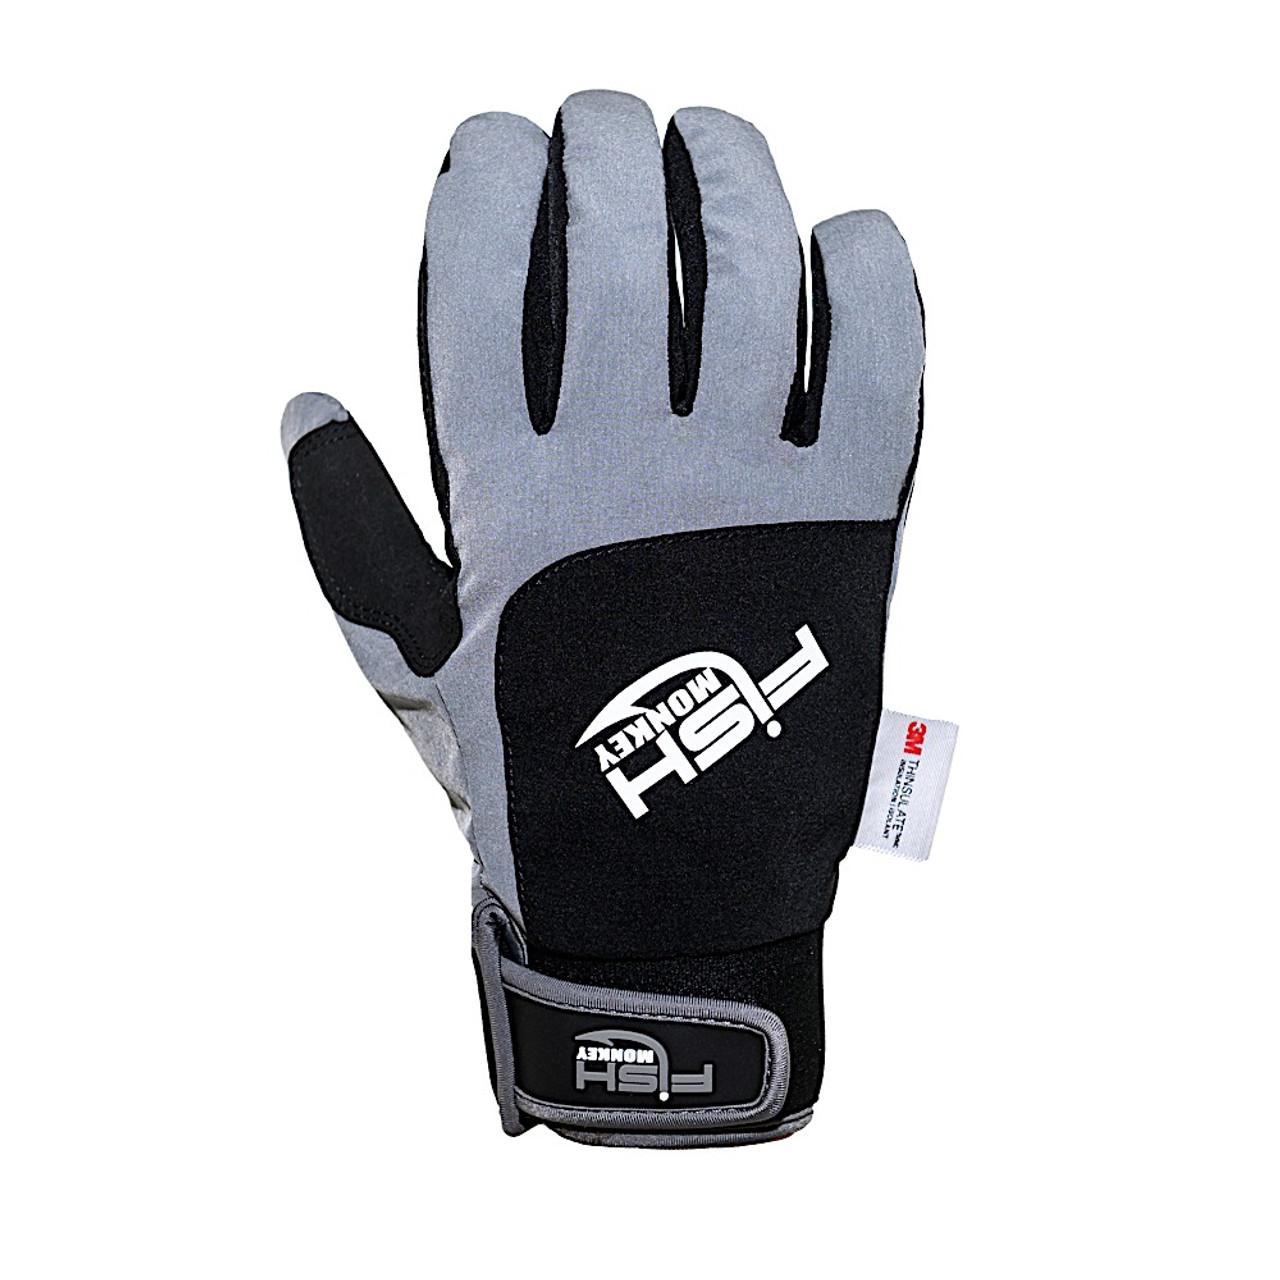 Fish Monkey FM38 Men's Stealth Dry Tec Waterproof Fishing Gloves